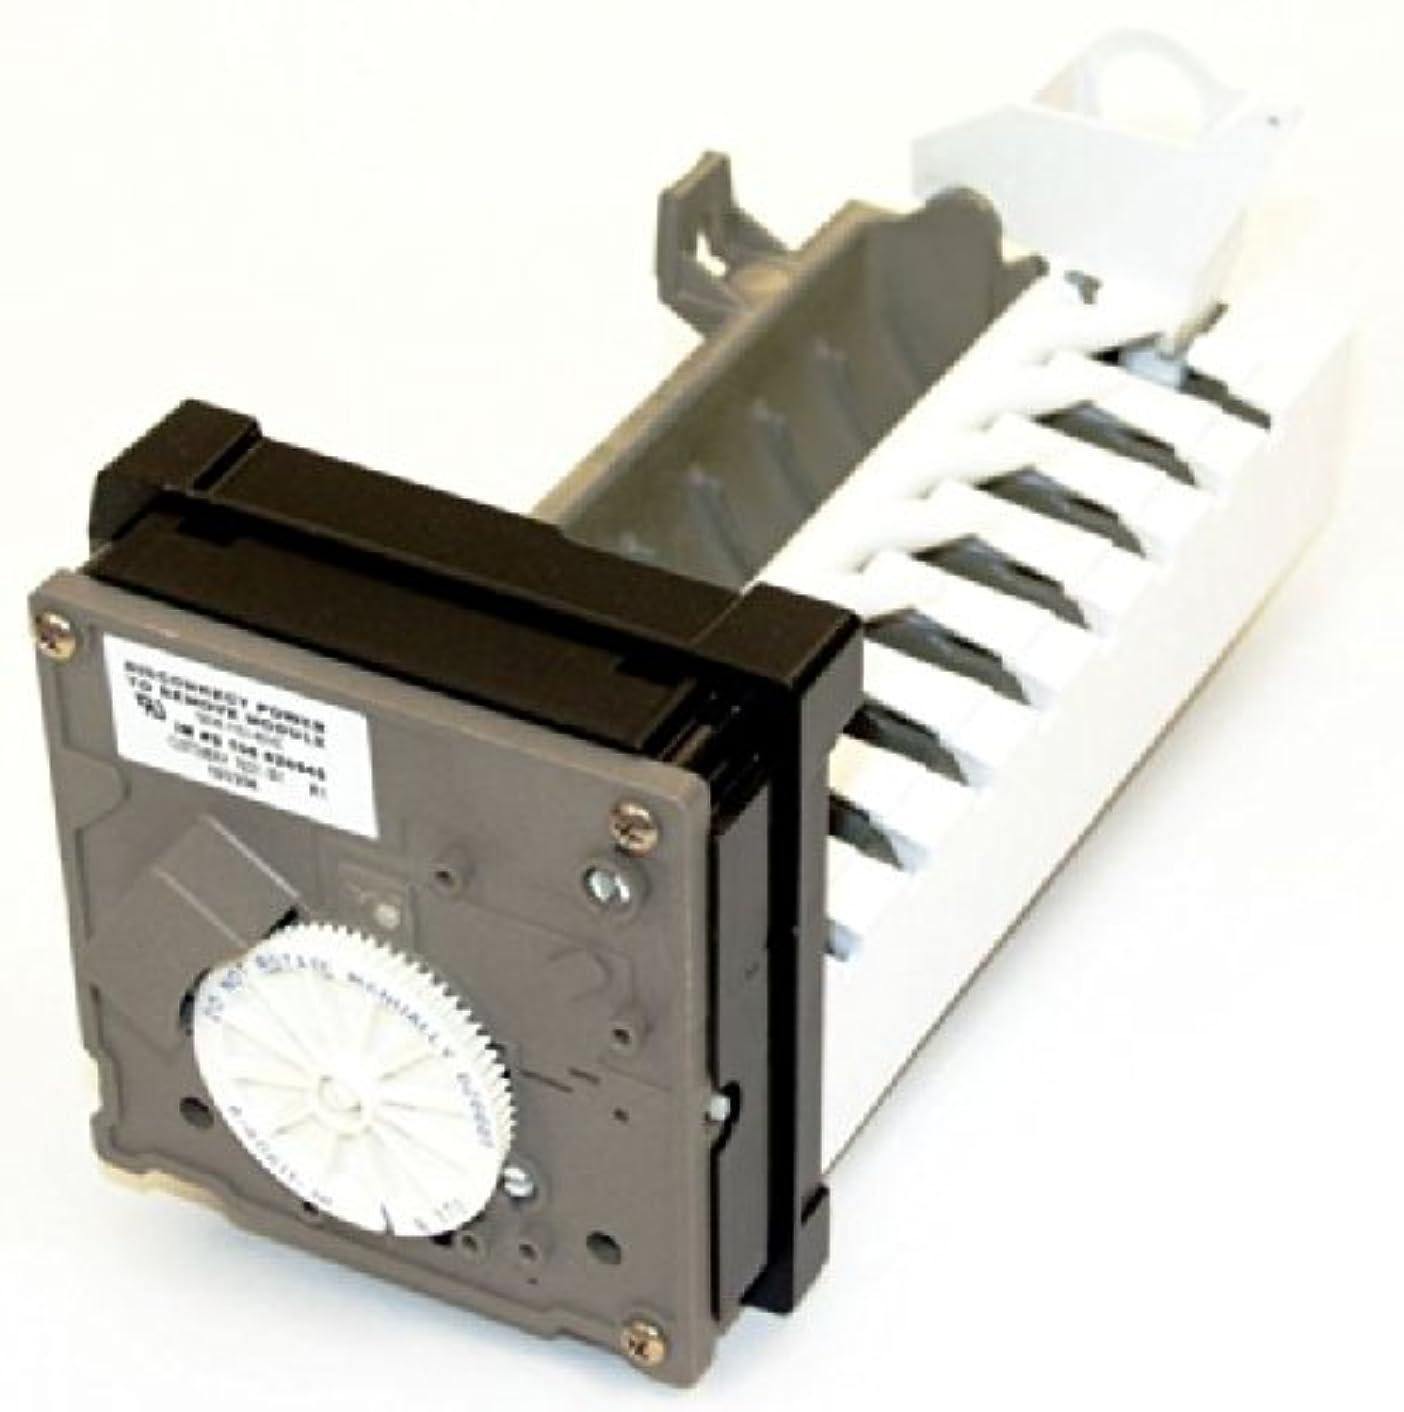 D7824706Q - Kitchen - Aid Replacement Refrigerator / Freezer Ice Maker